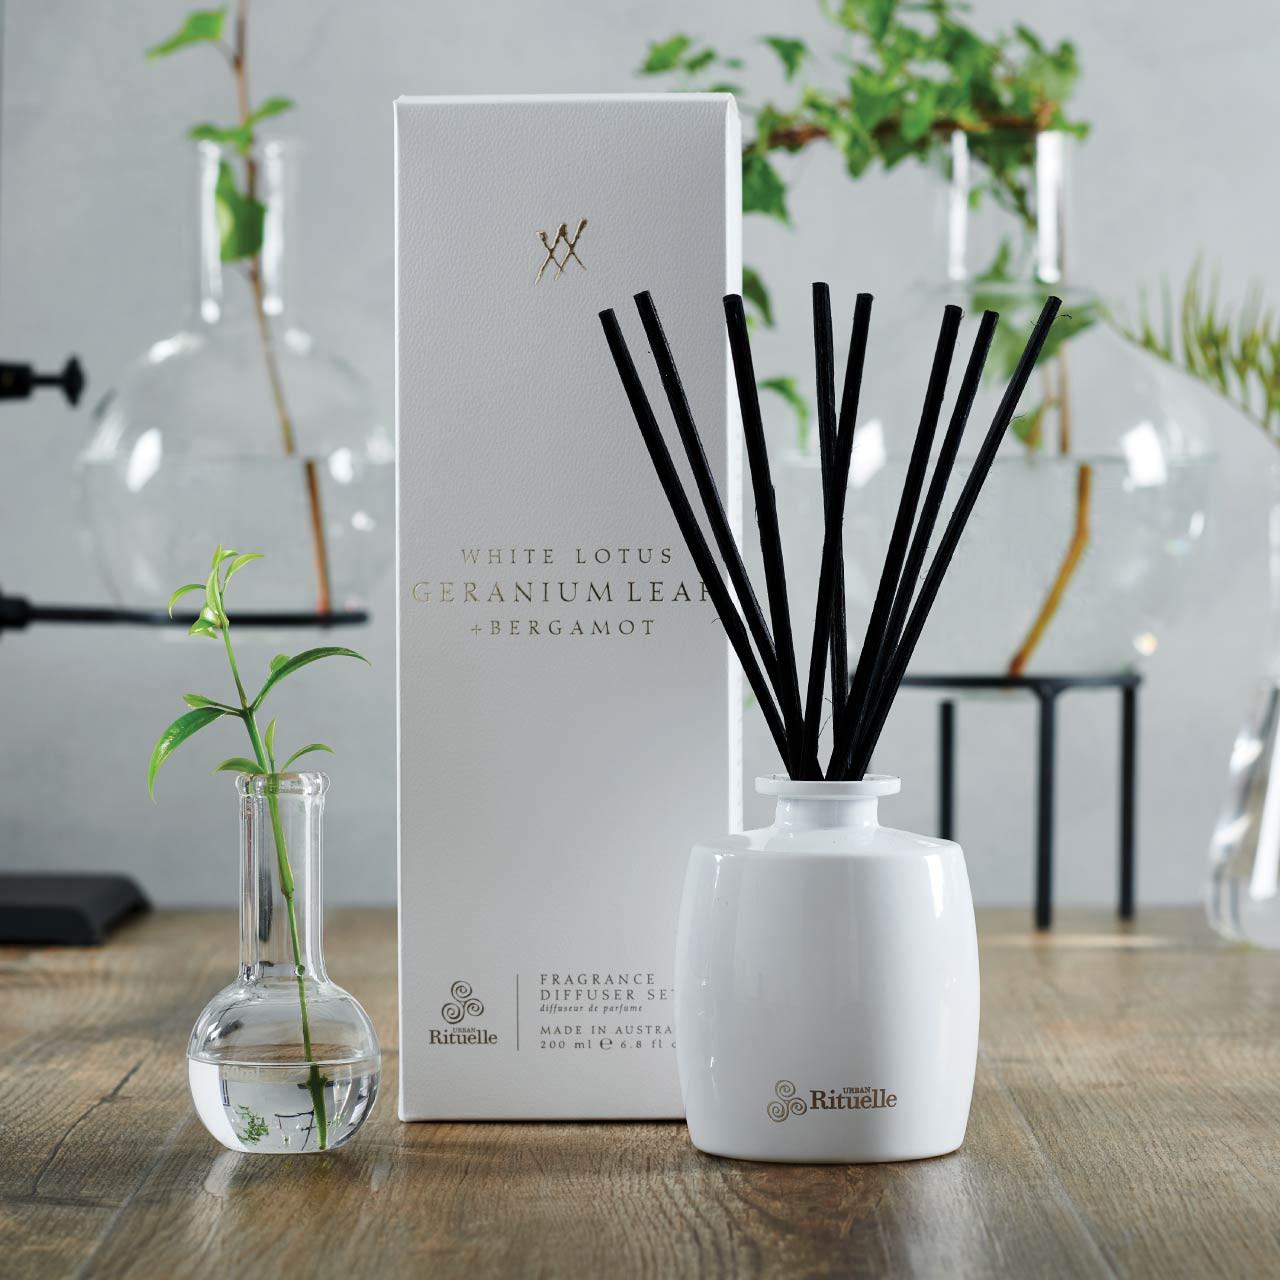 Alchemy - White Lotus, Geranium Leaf & Bergamot - Fragrance Diffuser Set - Urban Rituelle